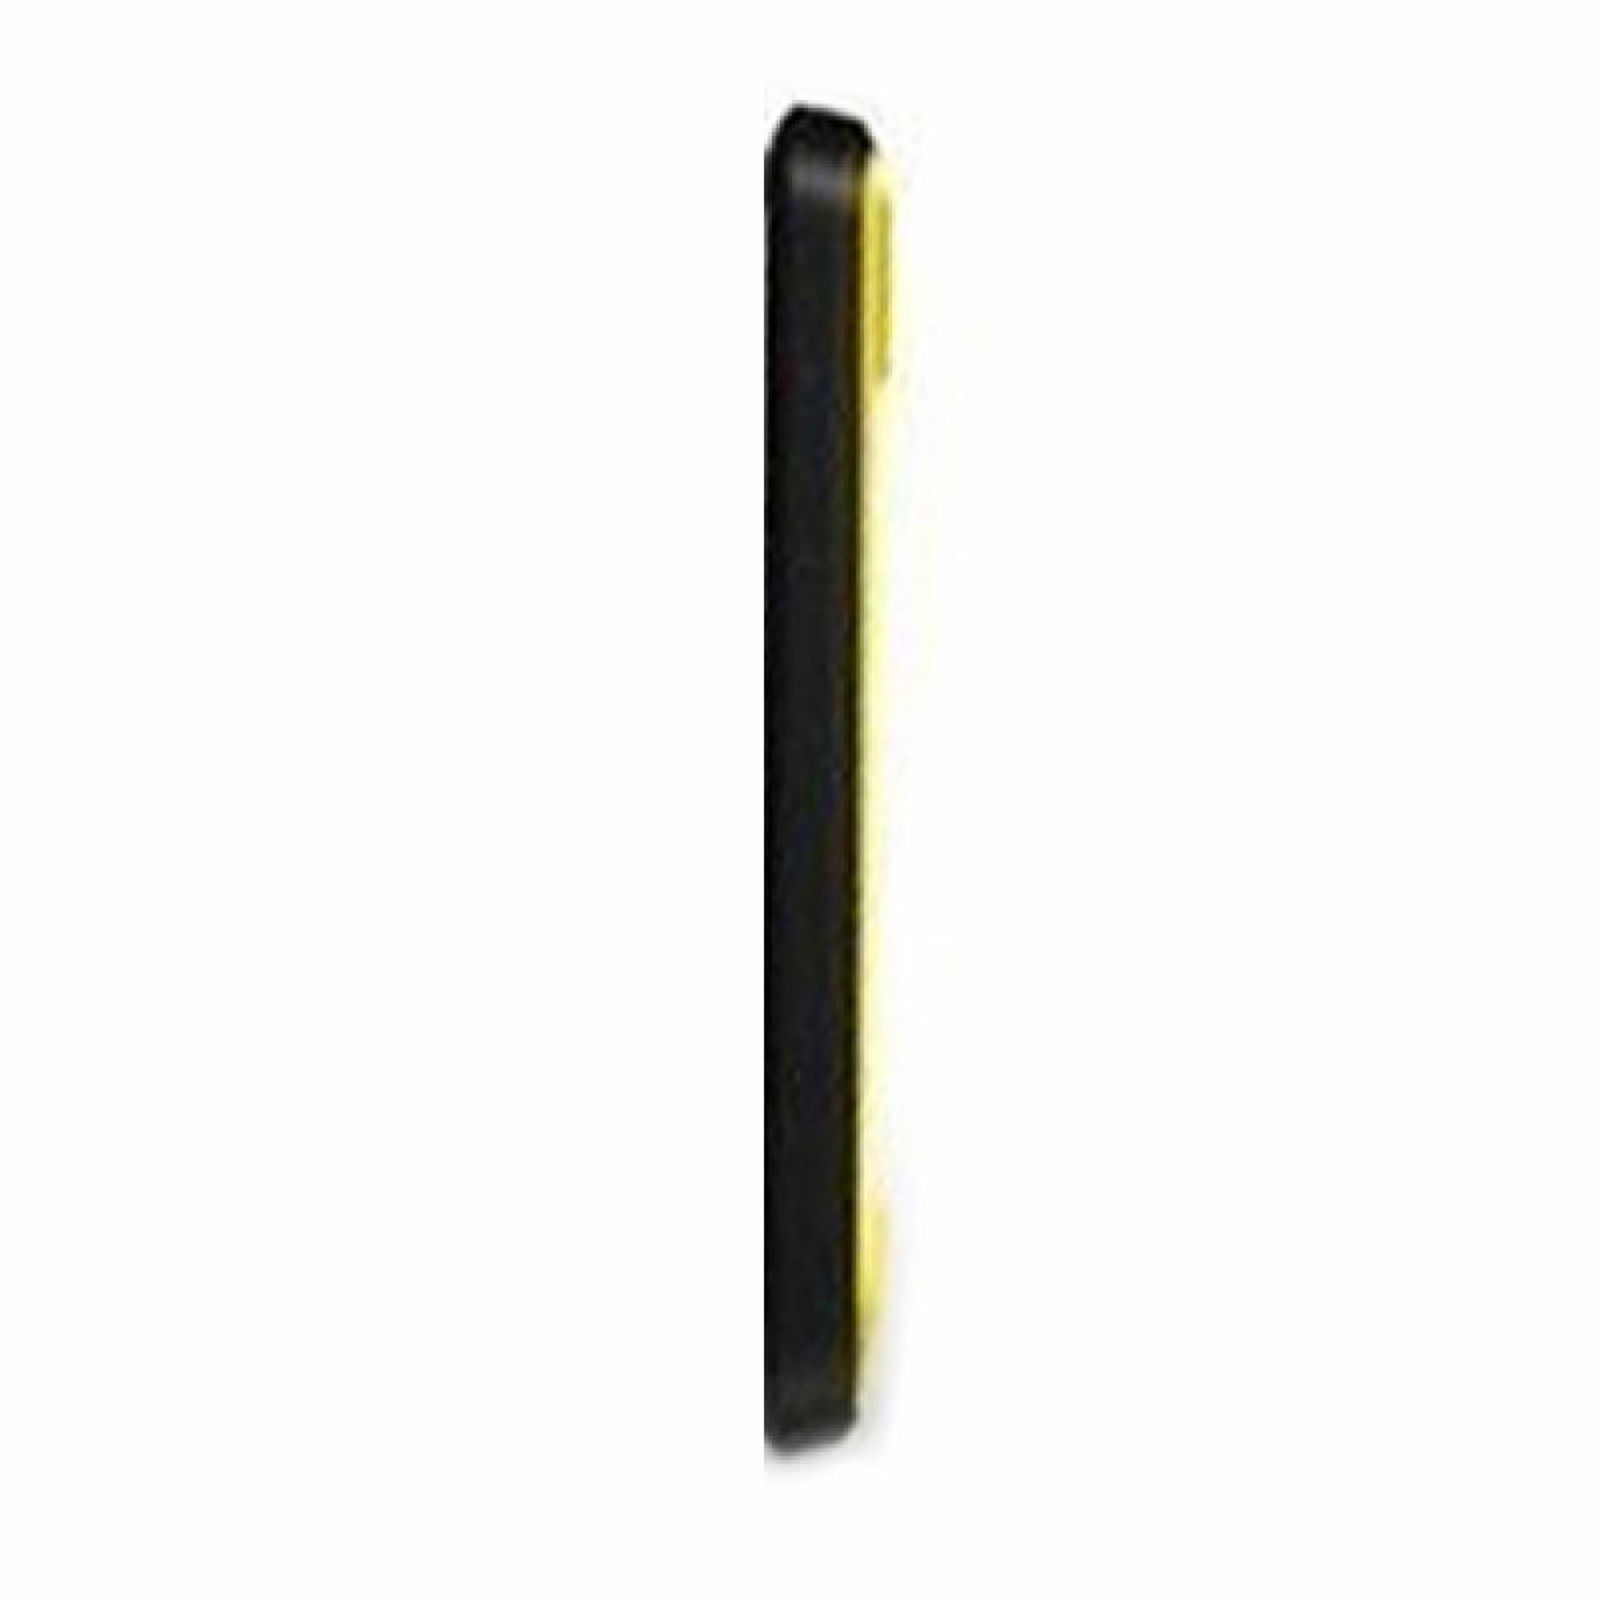 Чехол для моб. телефона Huawei Ascend D1 Flexible Protective Cover (51990293) изображение 3